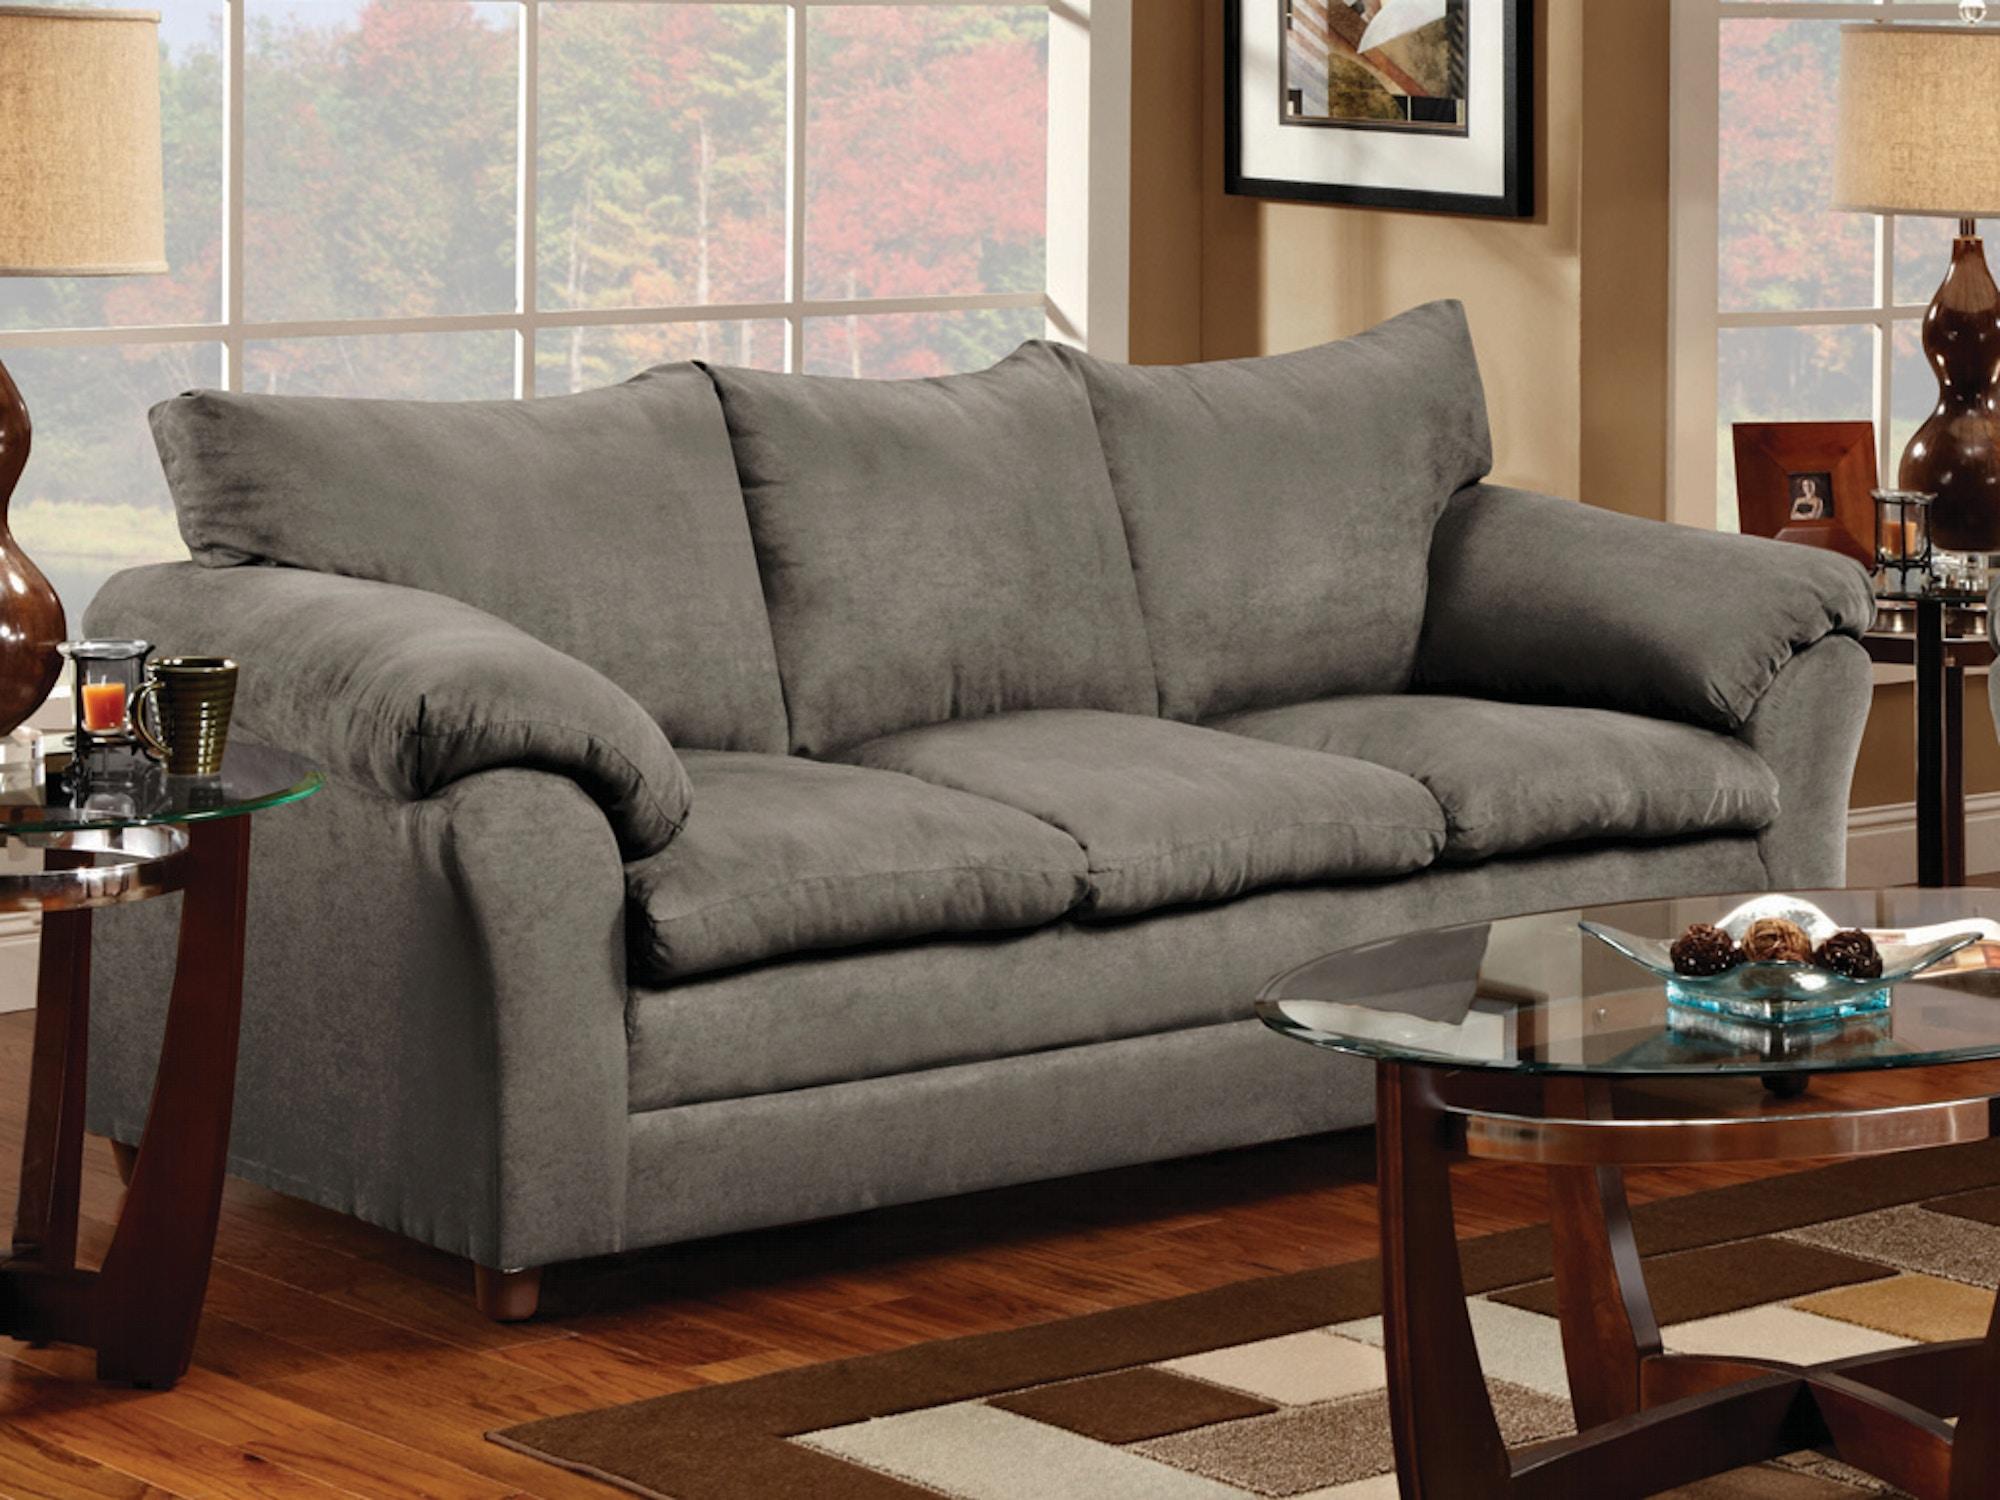 Sofas Cincinnati Sectional Sofas Furniture Cozy Living Room Design Using Cool Thesofa